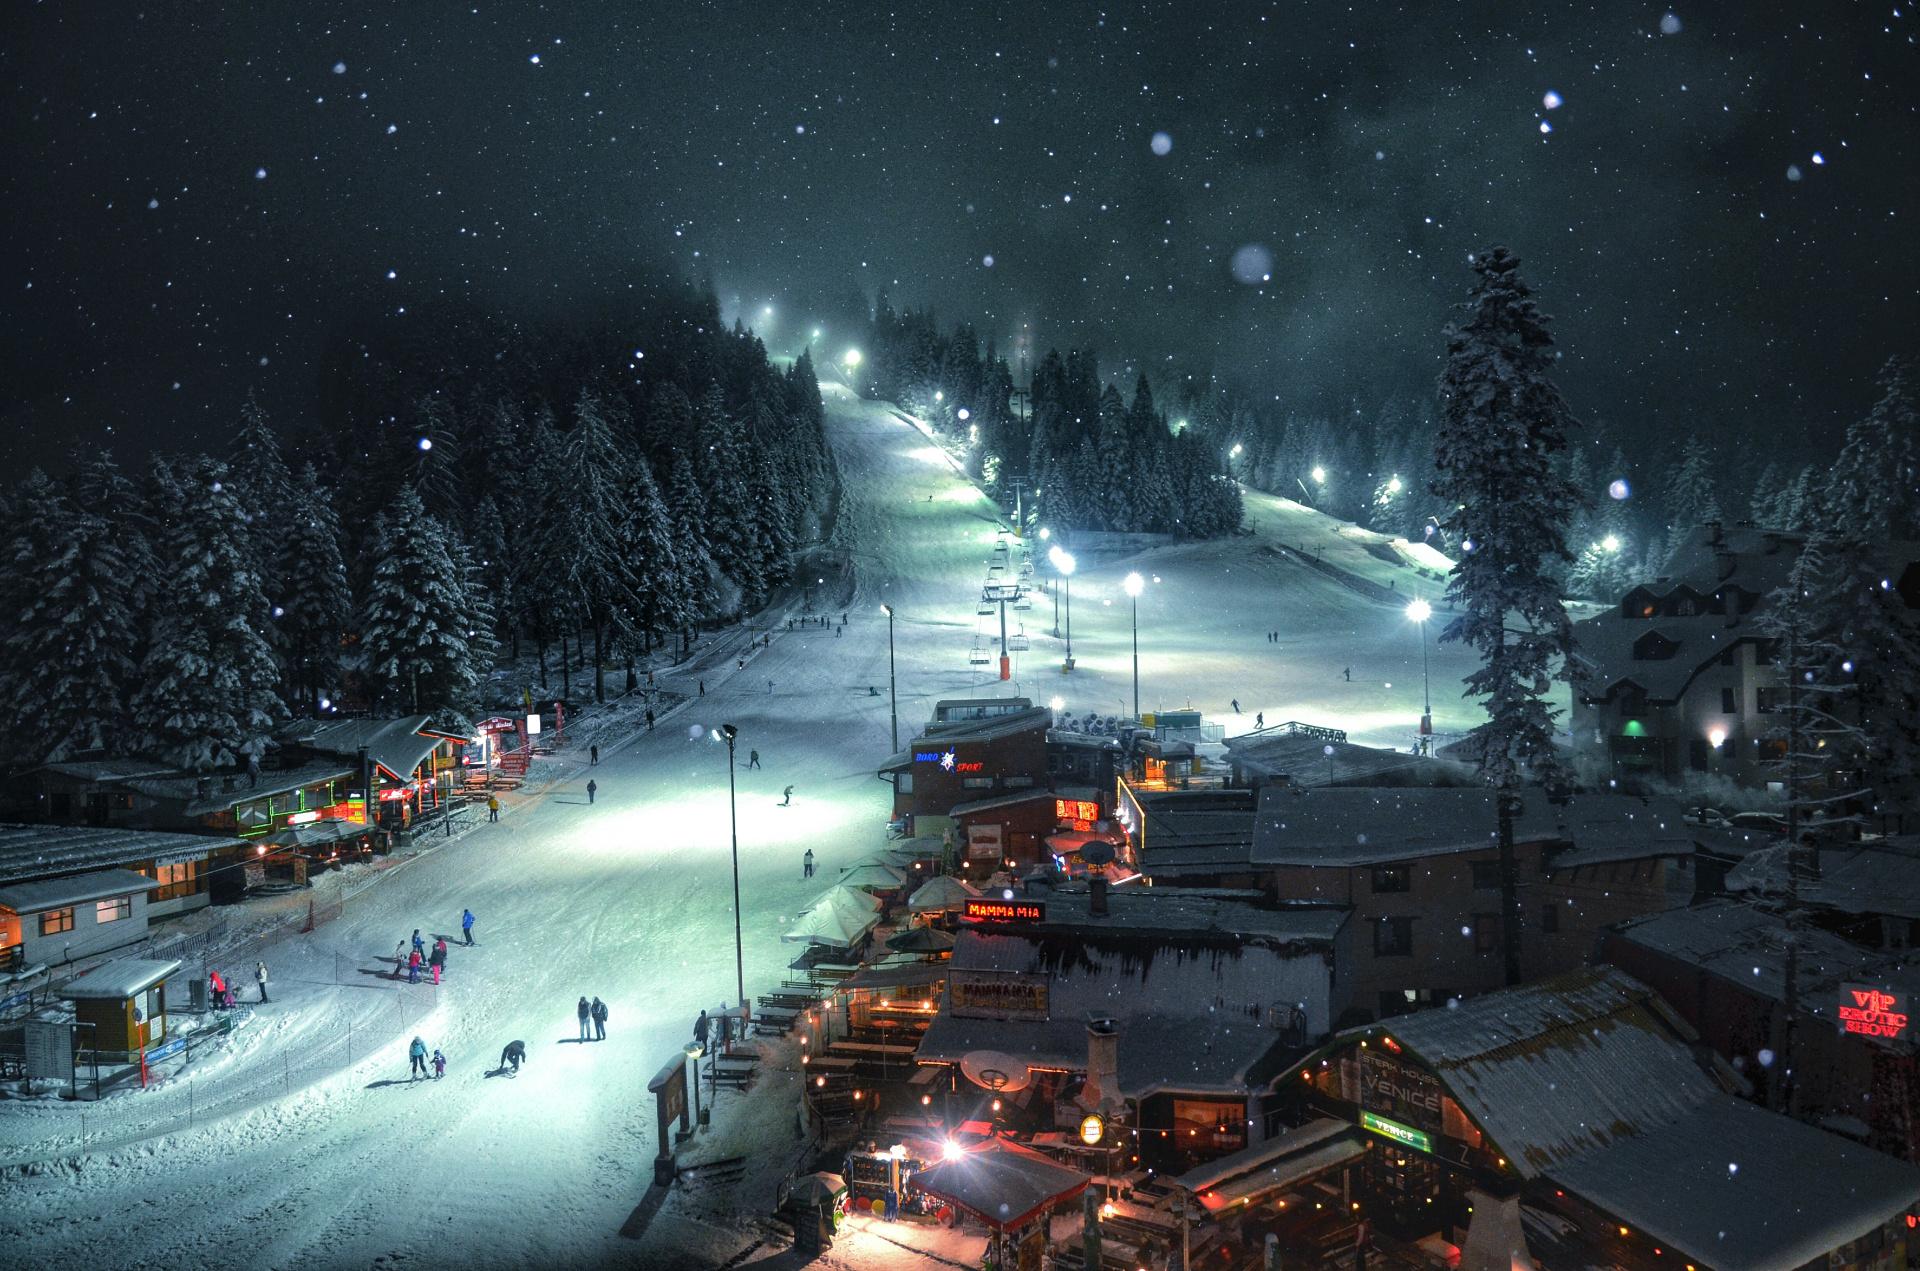 Noćno skijanje na Borovecu  | Lucky Bansko SPA & Relax